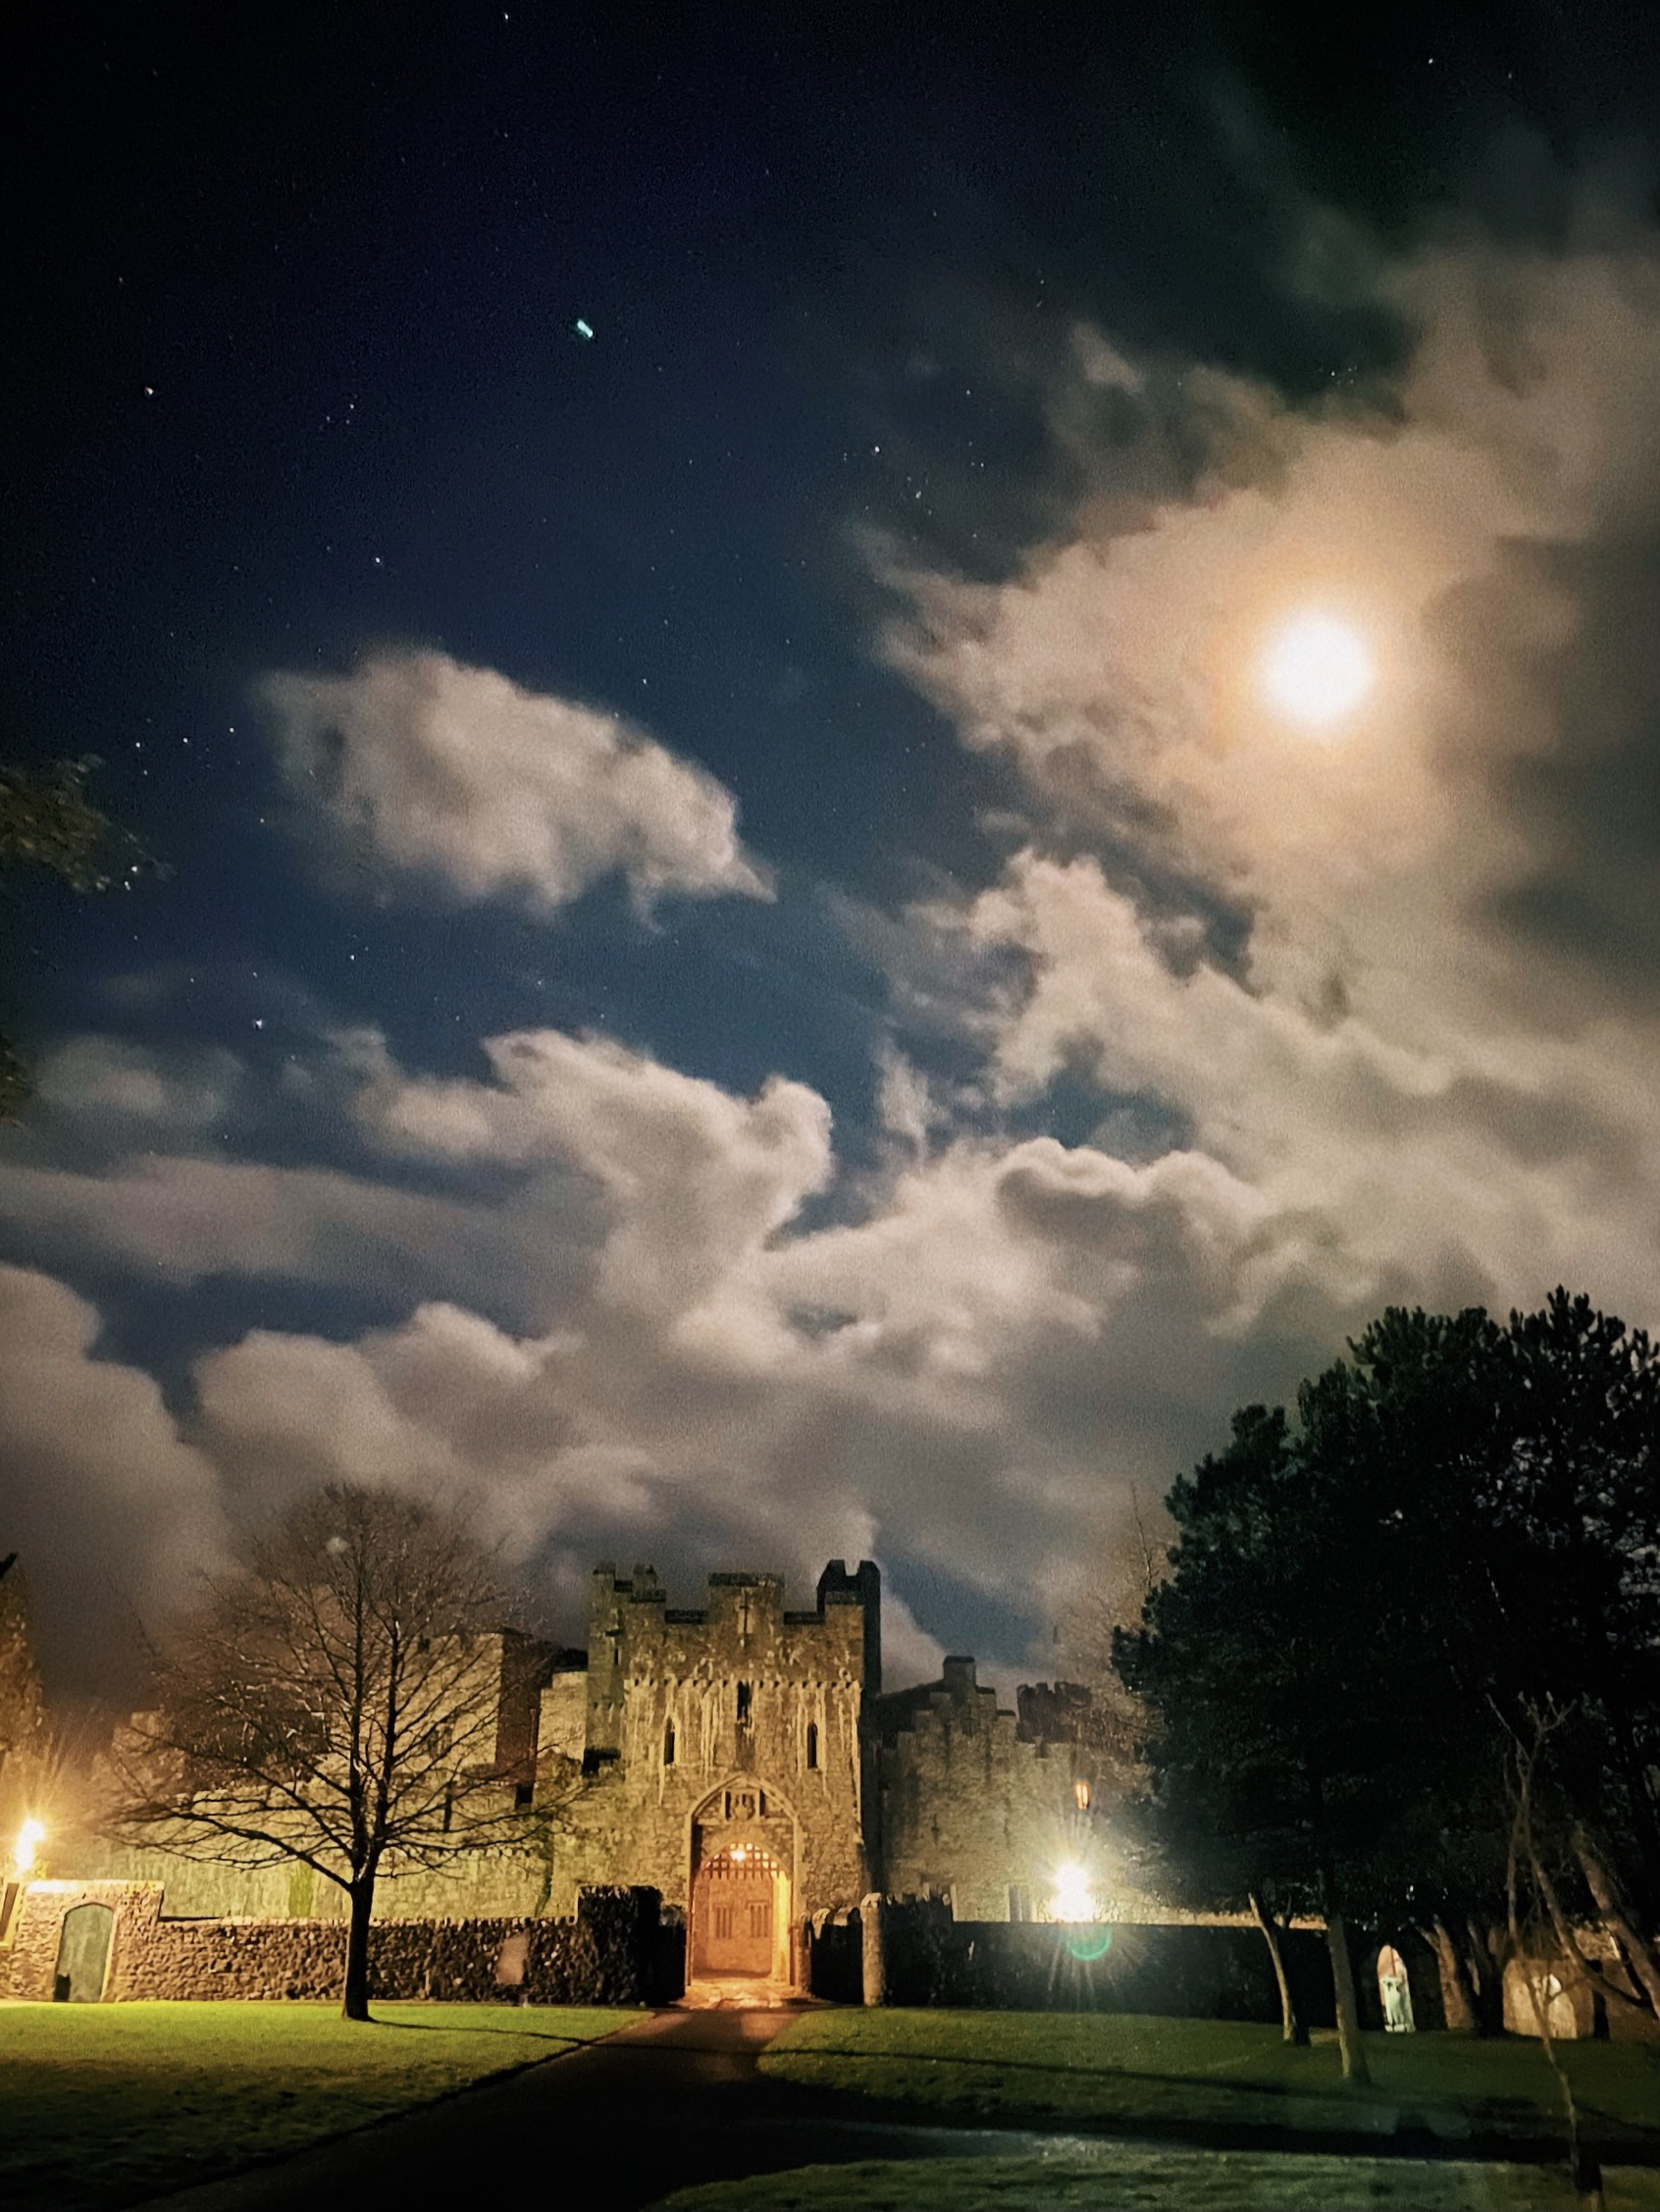 Halloween Spooktacular Film at St Donat's Castle: Hocus Pocus